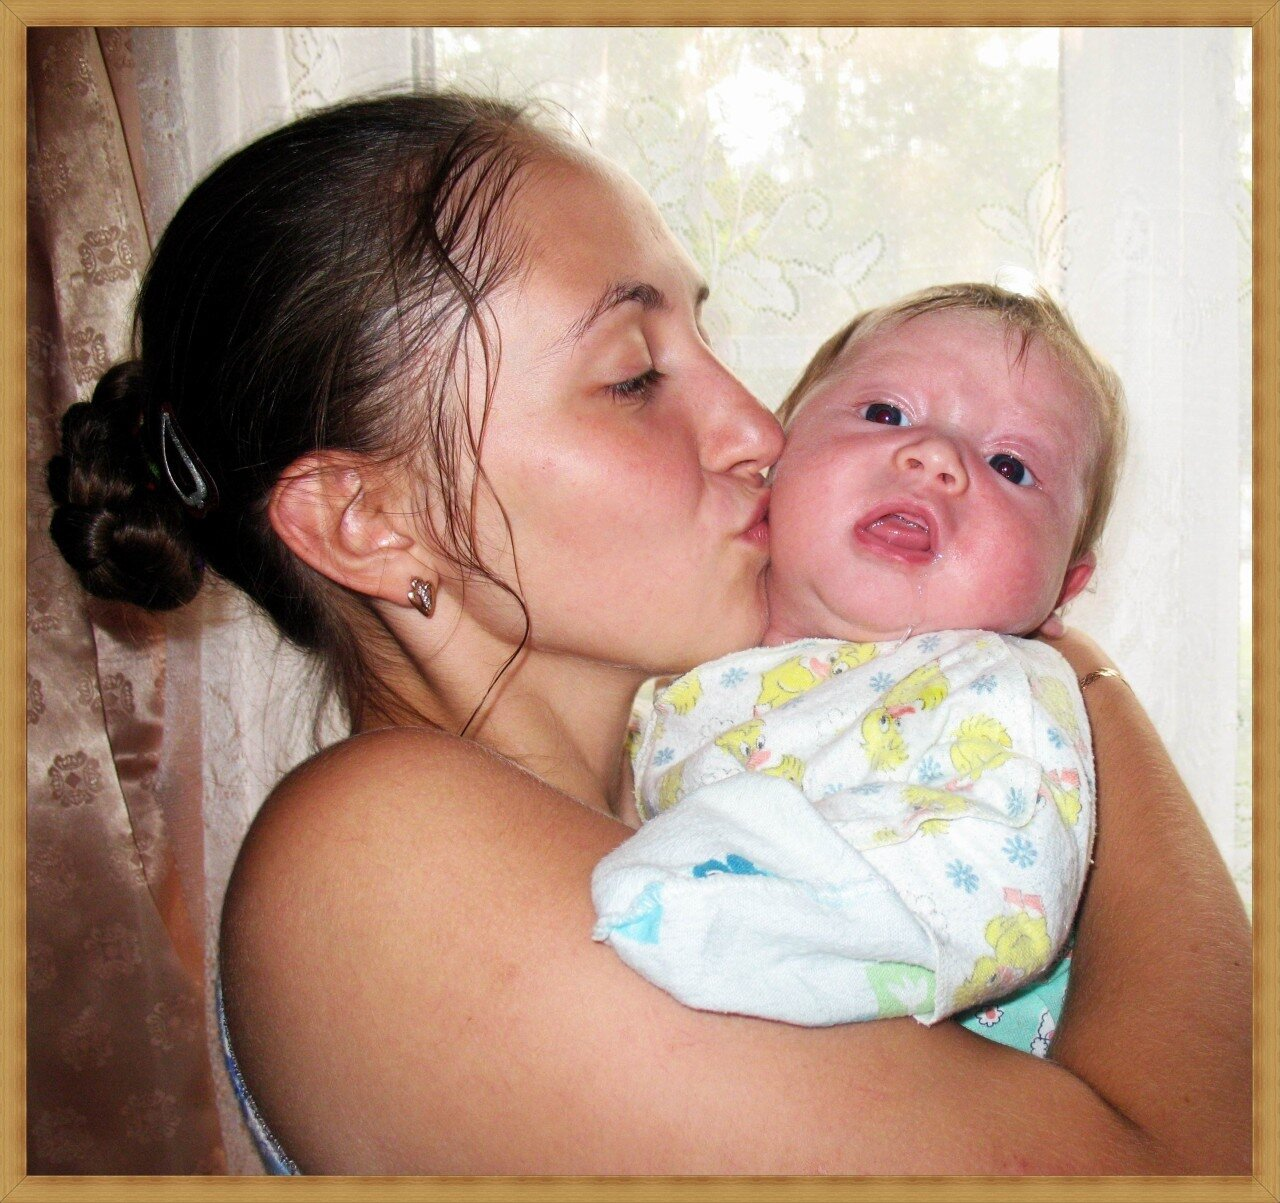 http://img-fotki.yandex.ru/get/4510/mgrekul.d/0_4cd97_7153533_XXXL.jpg